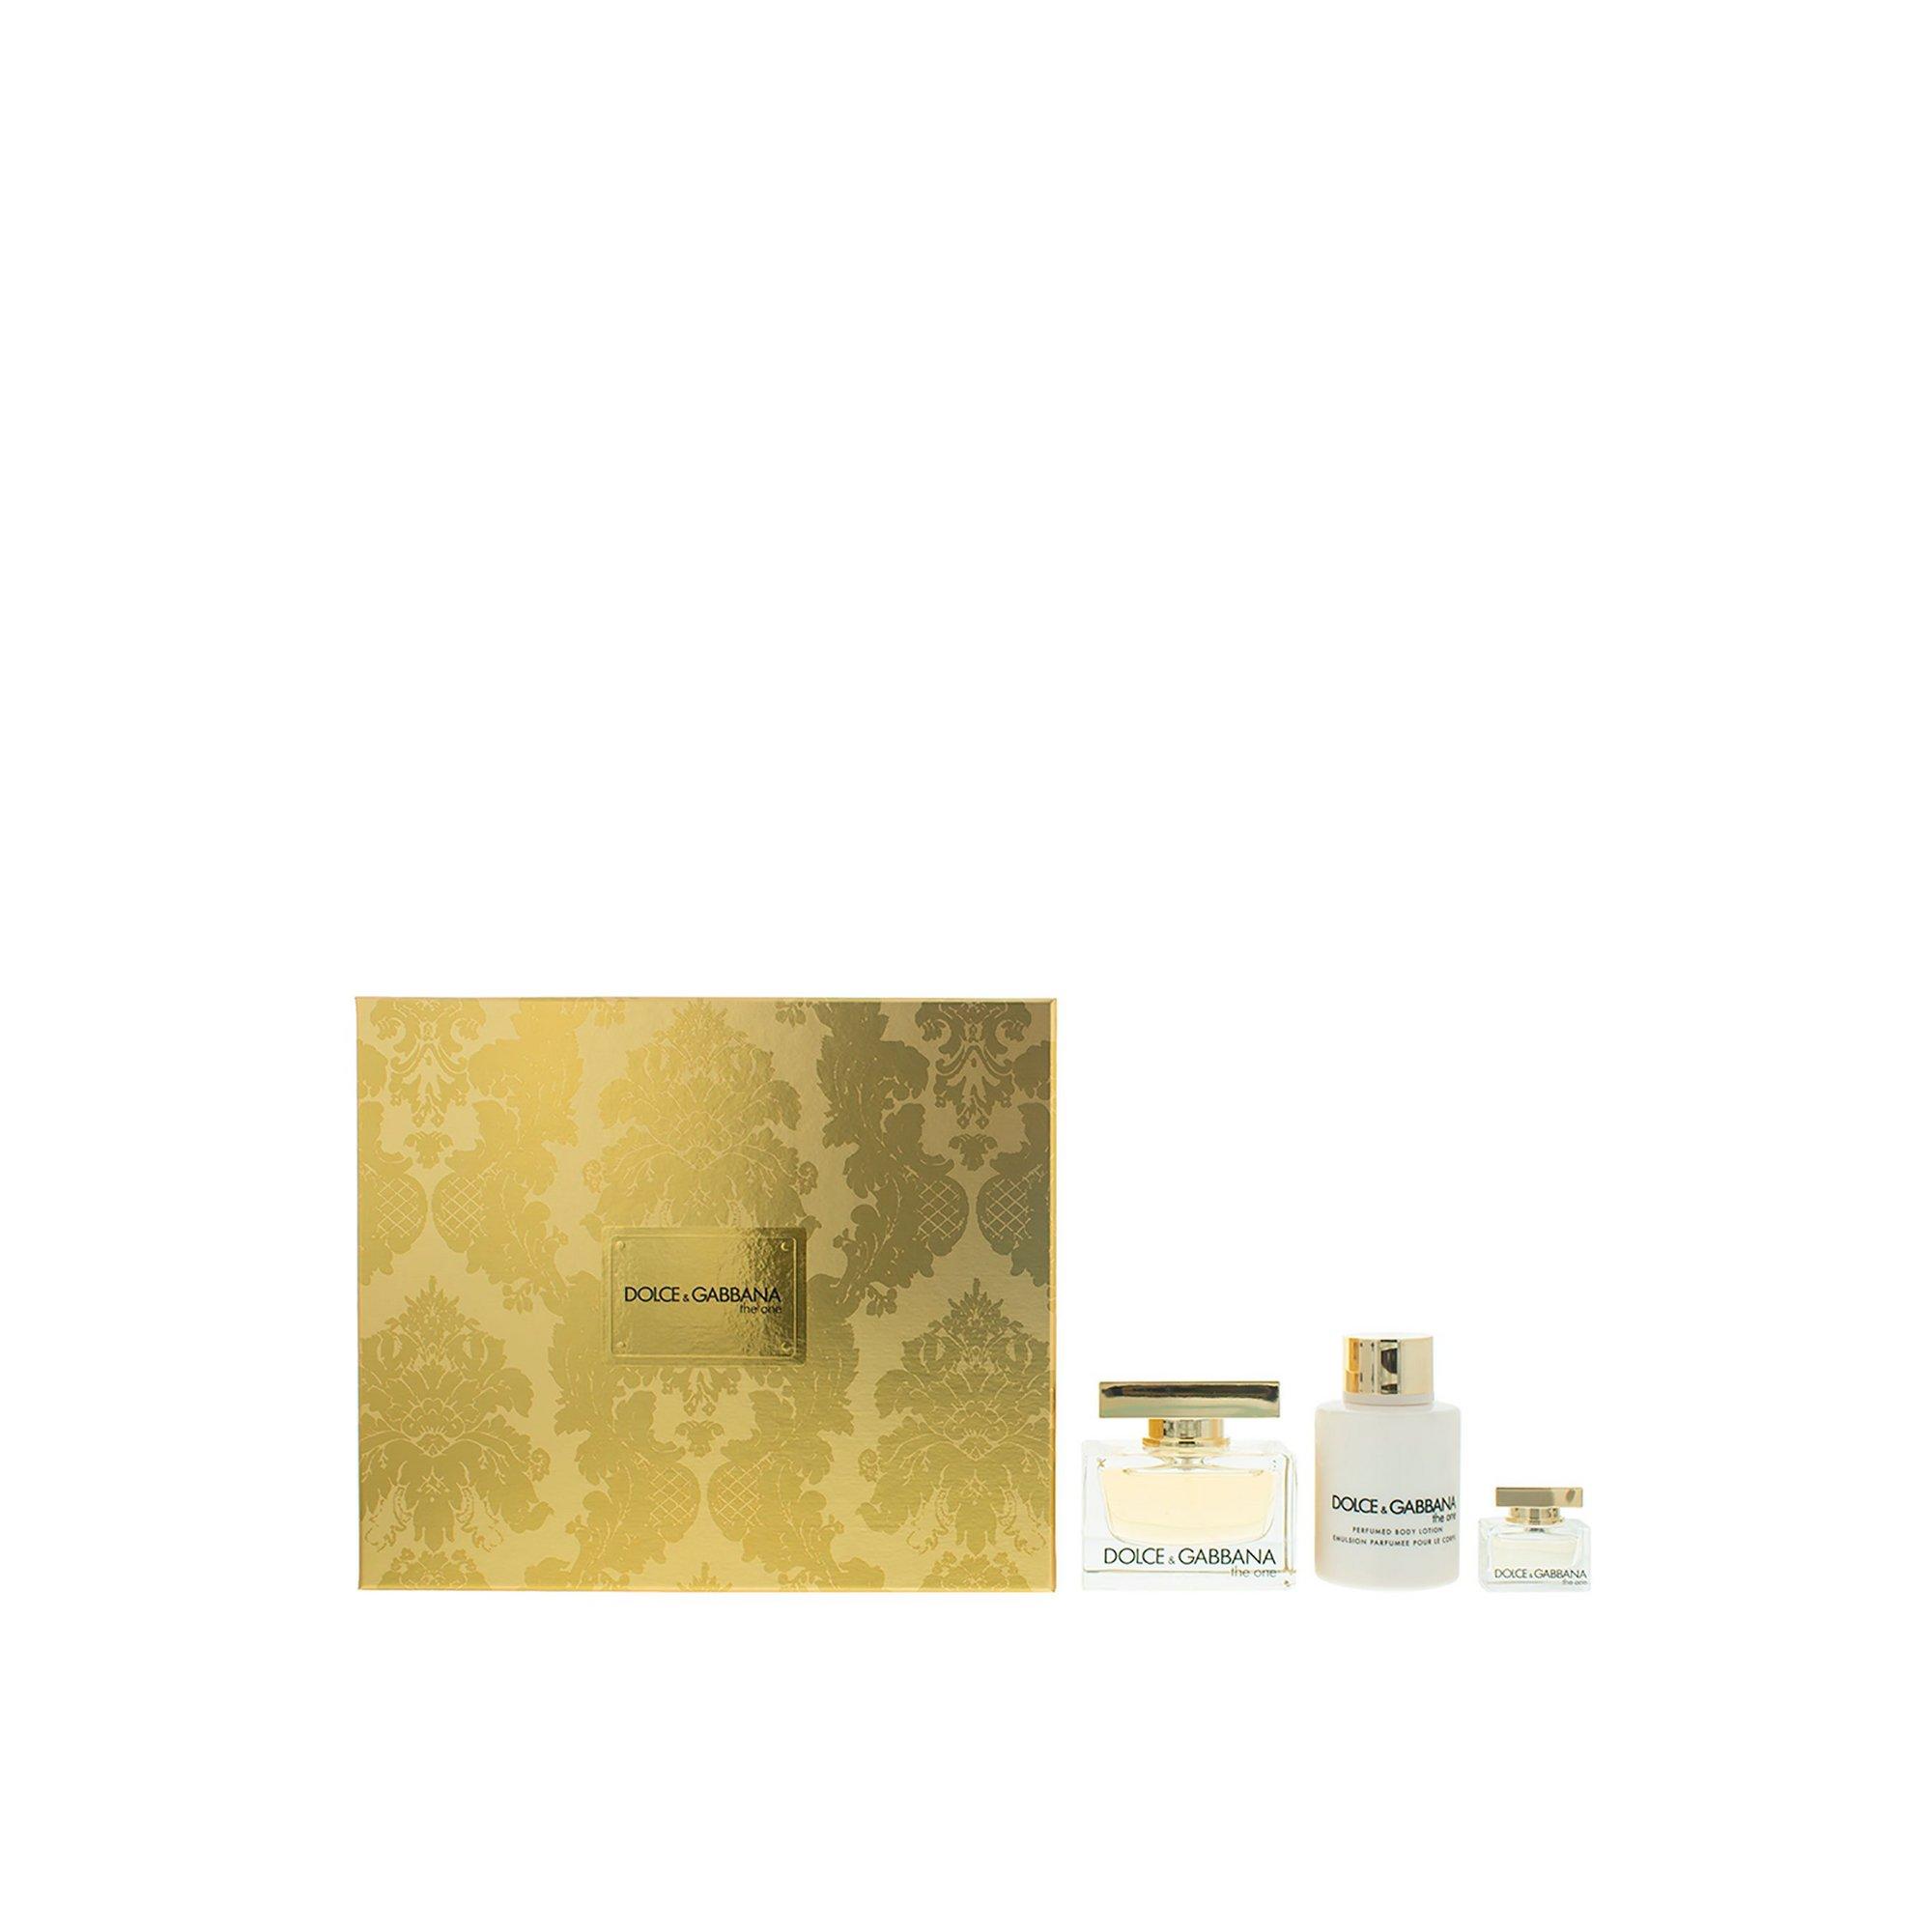 Image of Dolce and Gabbana The One 50ml Eau De Parfum Gift Set